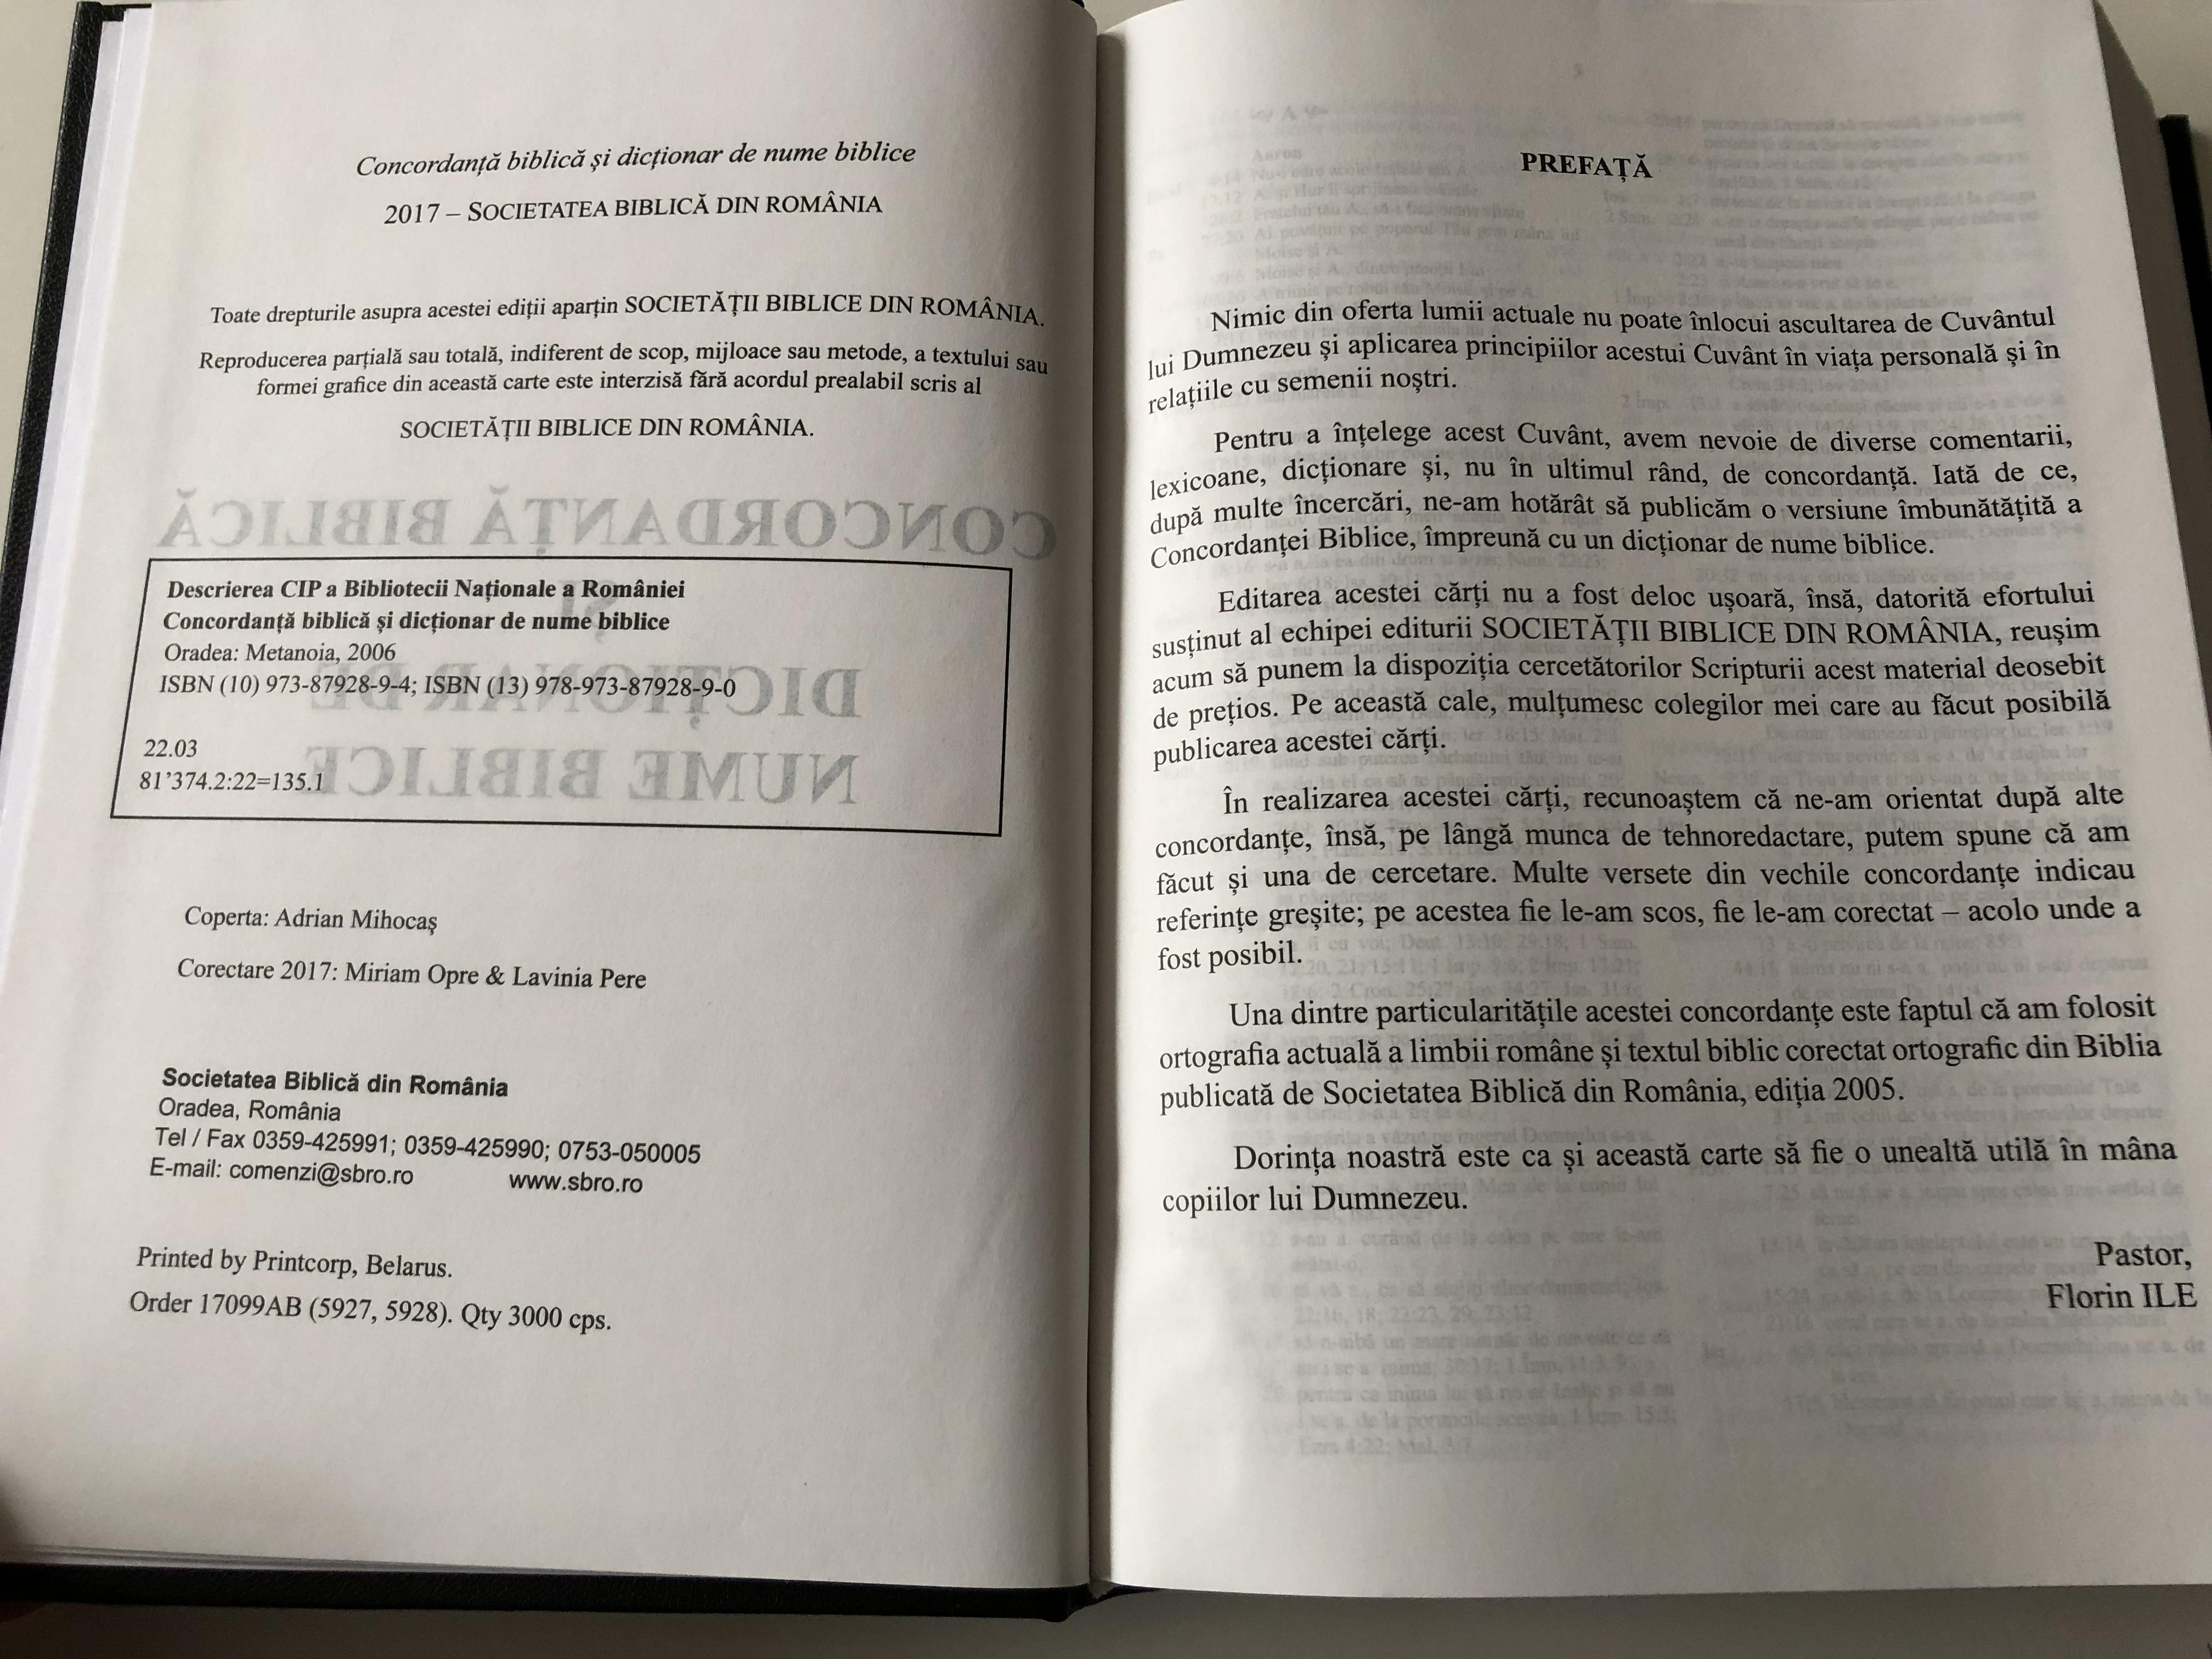 big-concordance-to-the-romanian-bible-4-.jpg